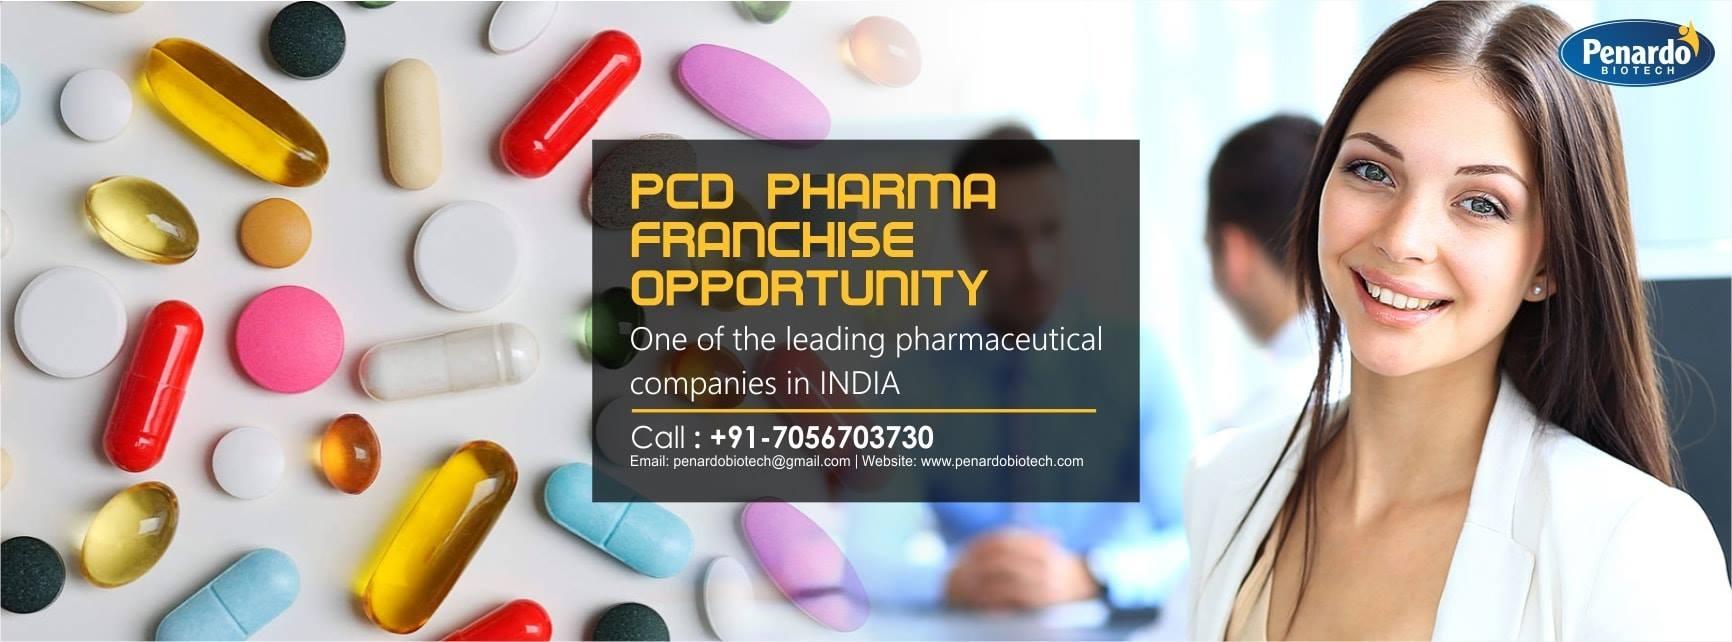 Penardo Biotech Pvt. Ltd. (@penardobiotech) Cover Image